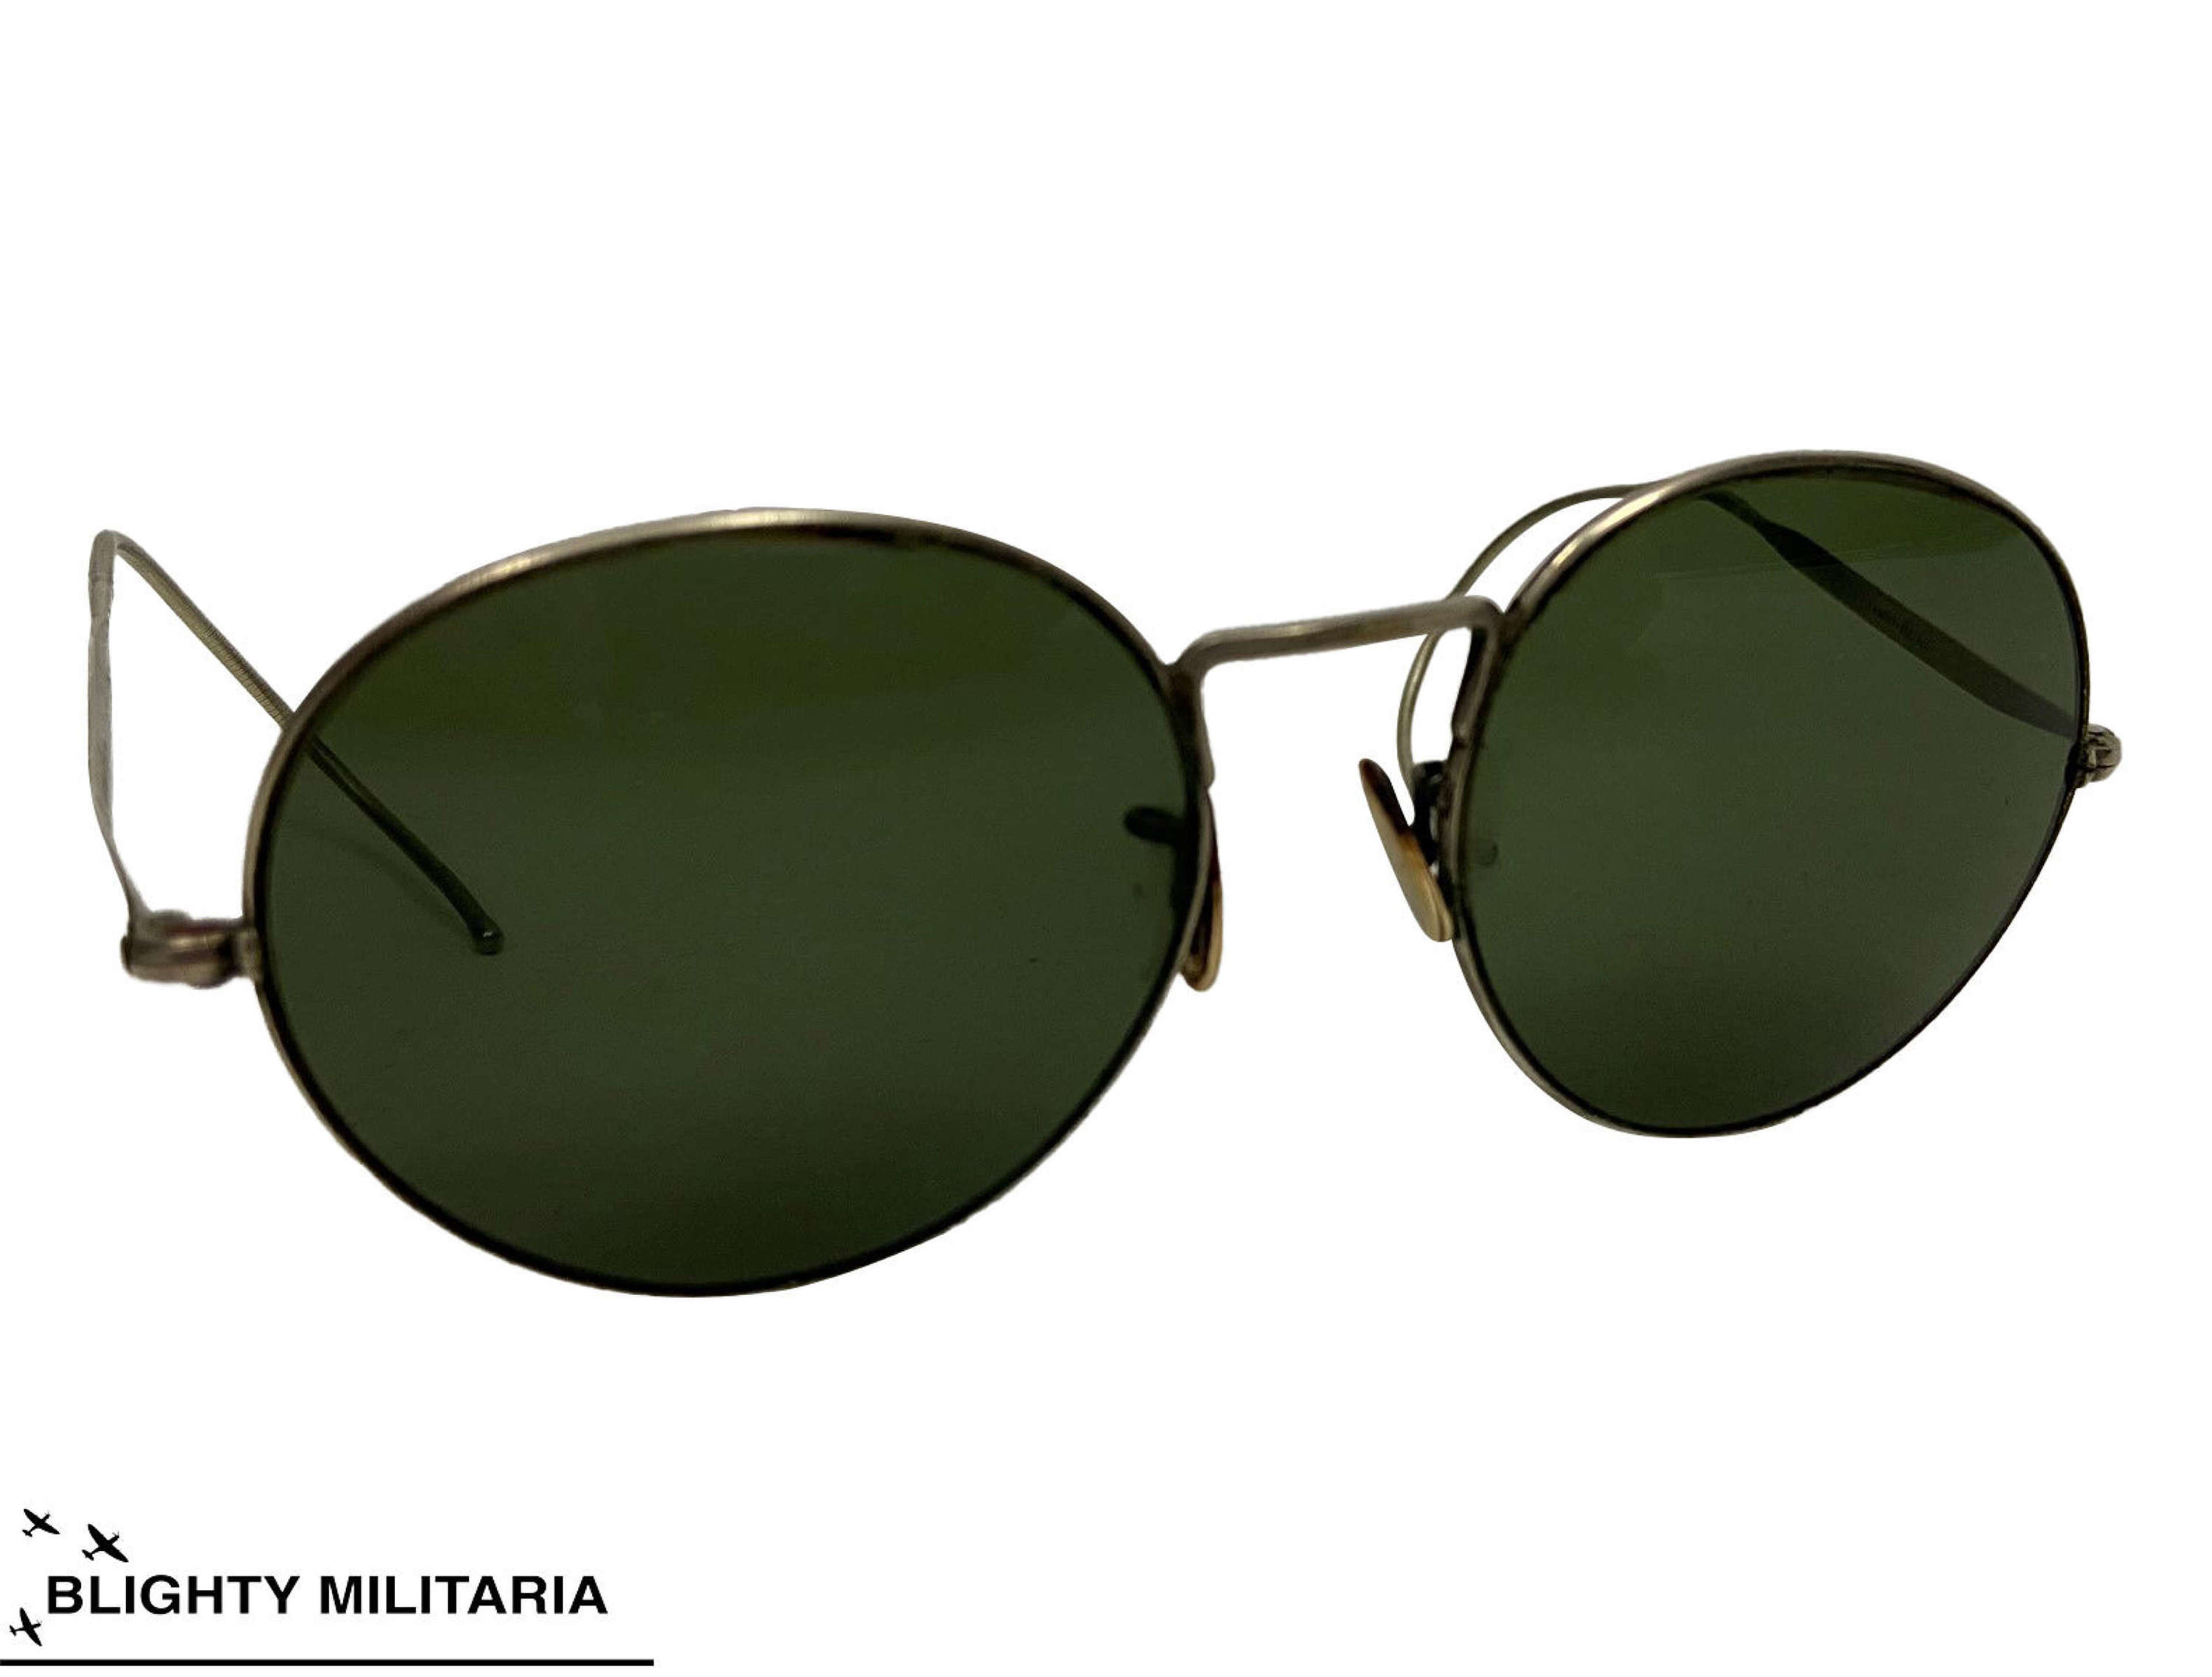 Original WW2 RAF MK VIII Anti Glare Spectacles Sunglasses